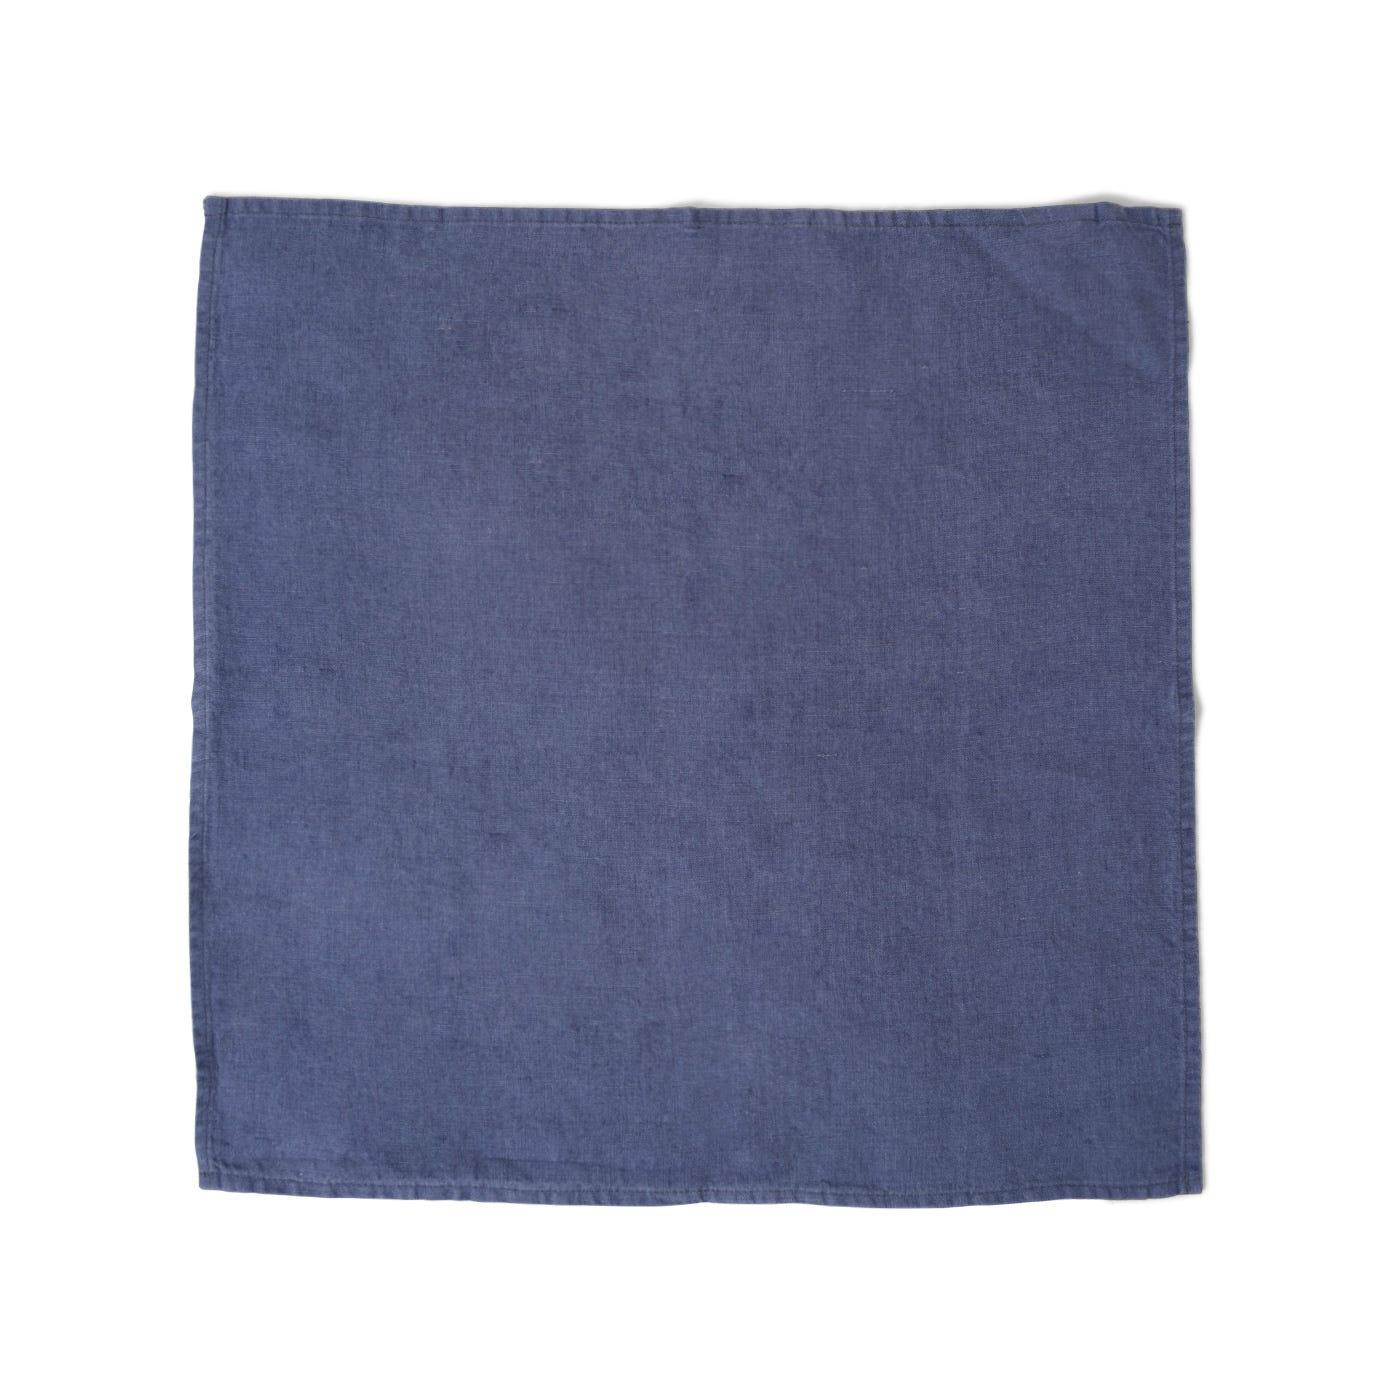 Heal's Linen Napkin Denim Blue